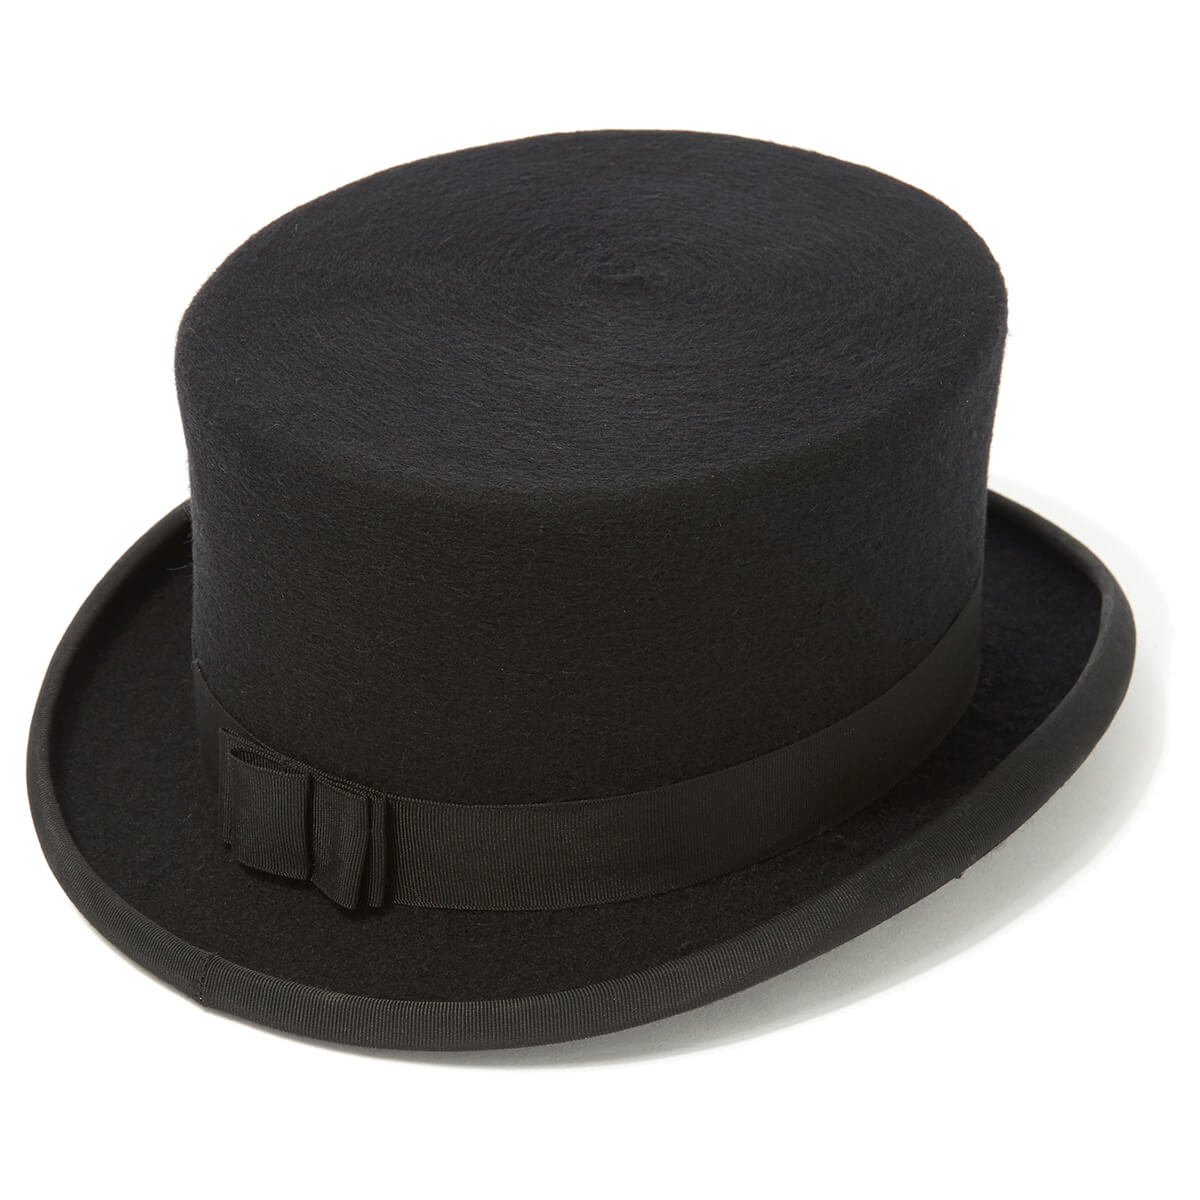 Wool Felt Dressage - Black - 62cm